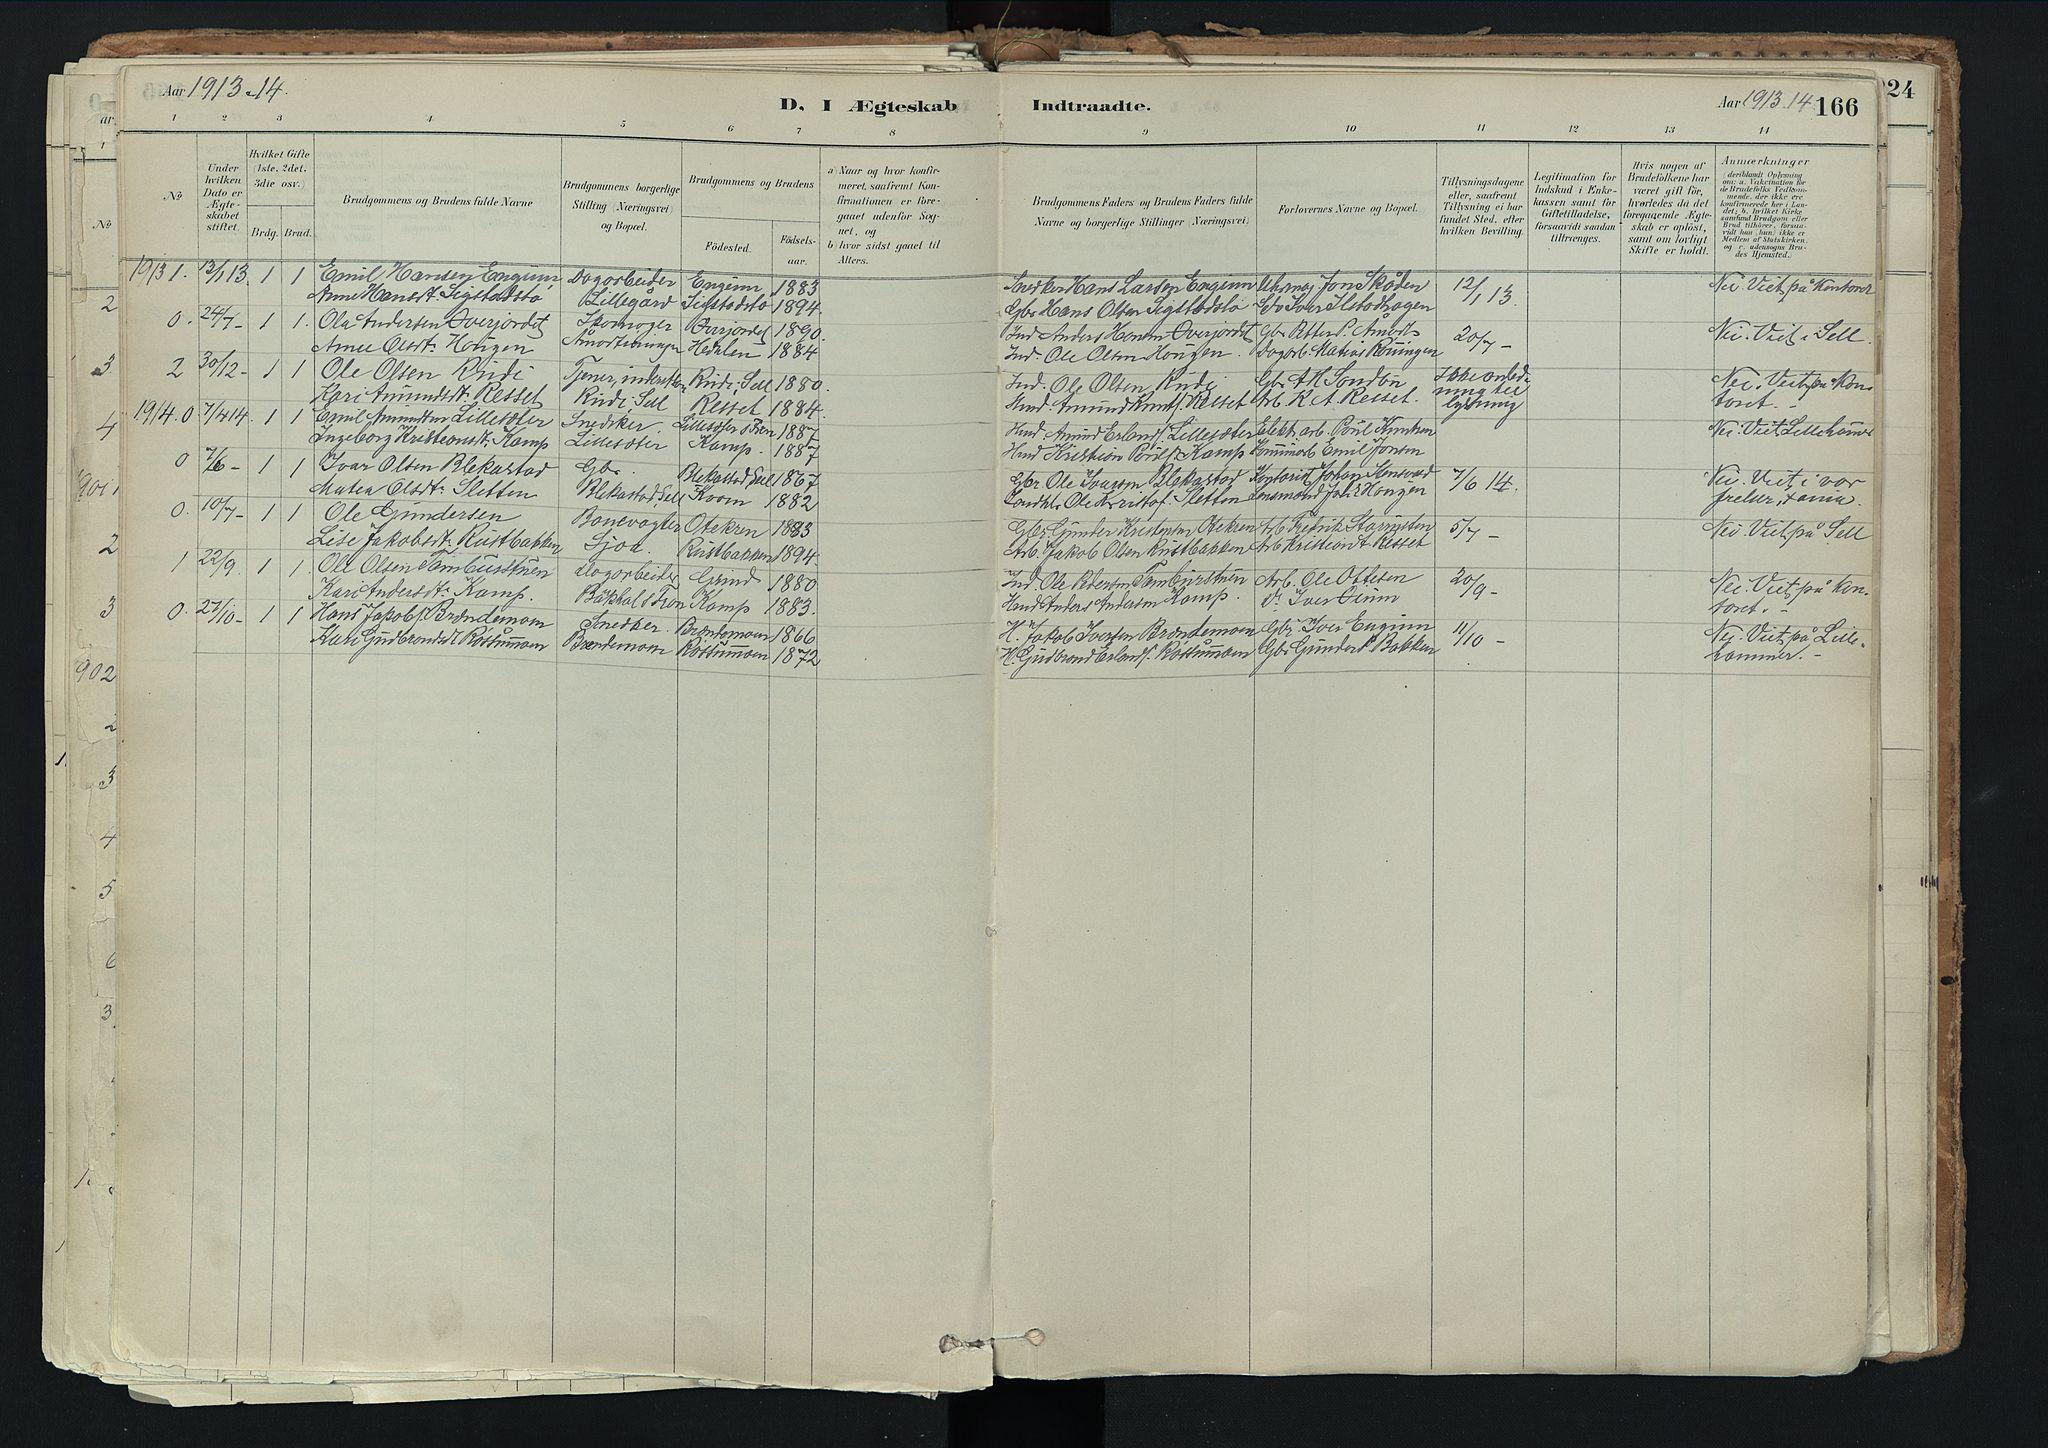 SAH, Nord-Fron prestekontor, Ministerialbok nr. 3, 1884-1914, s. 166